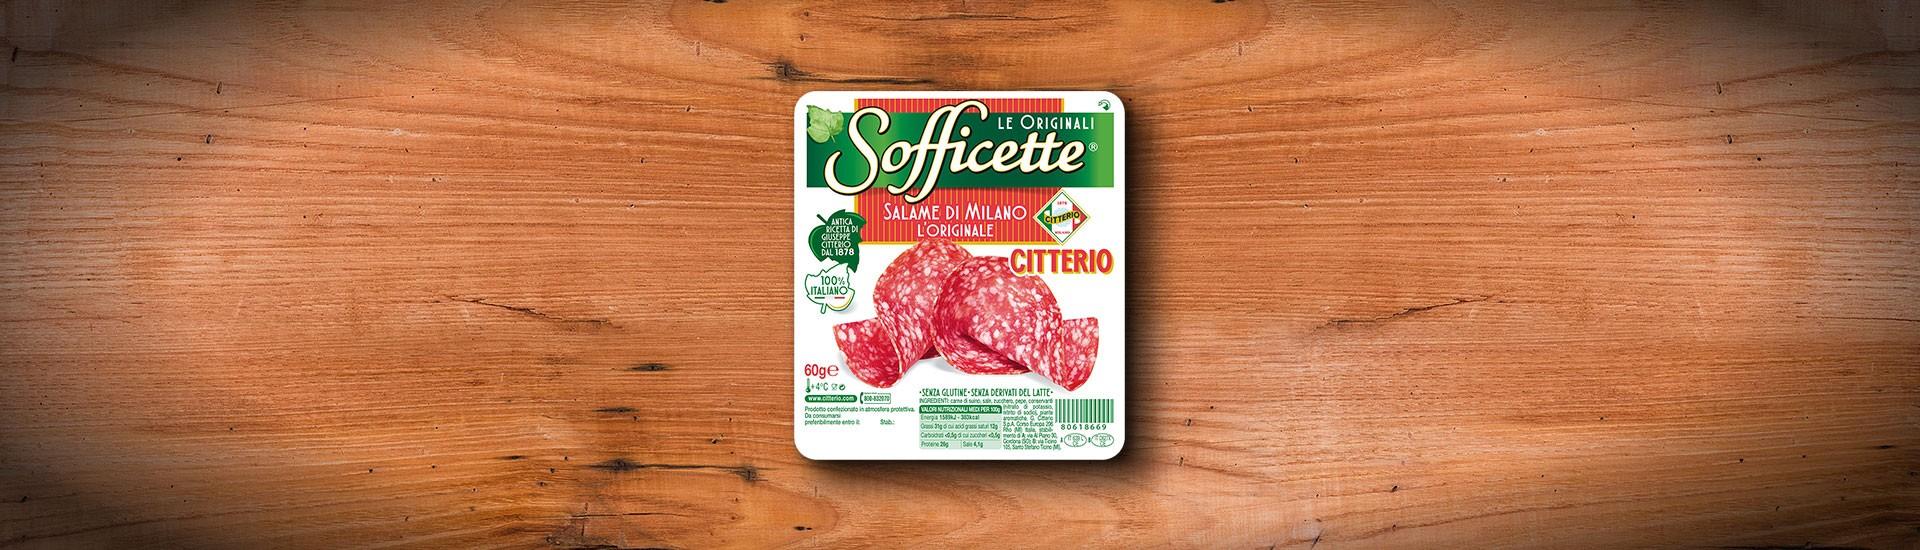 L'originale Salame di Milano